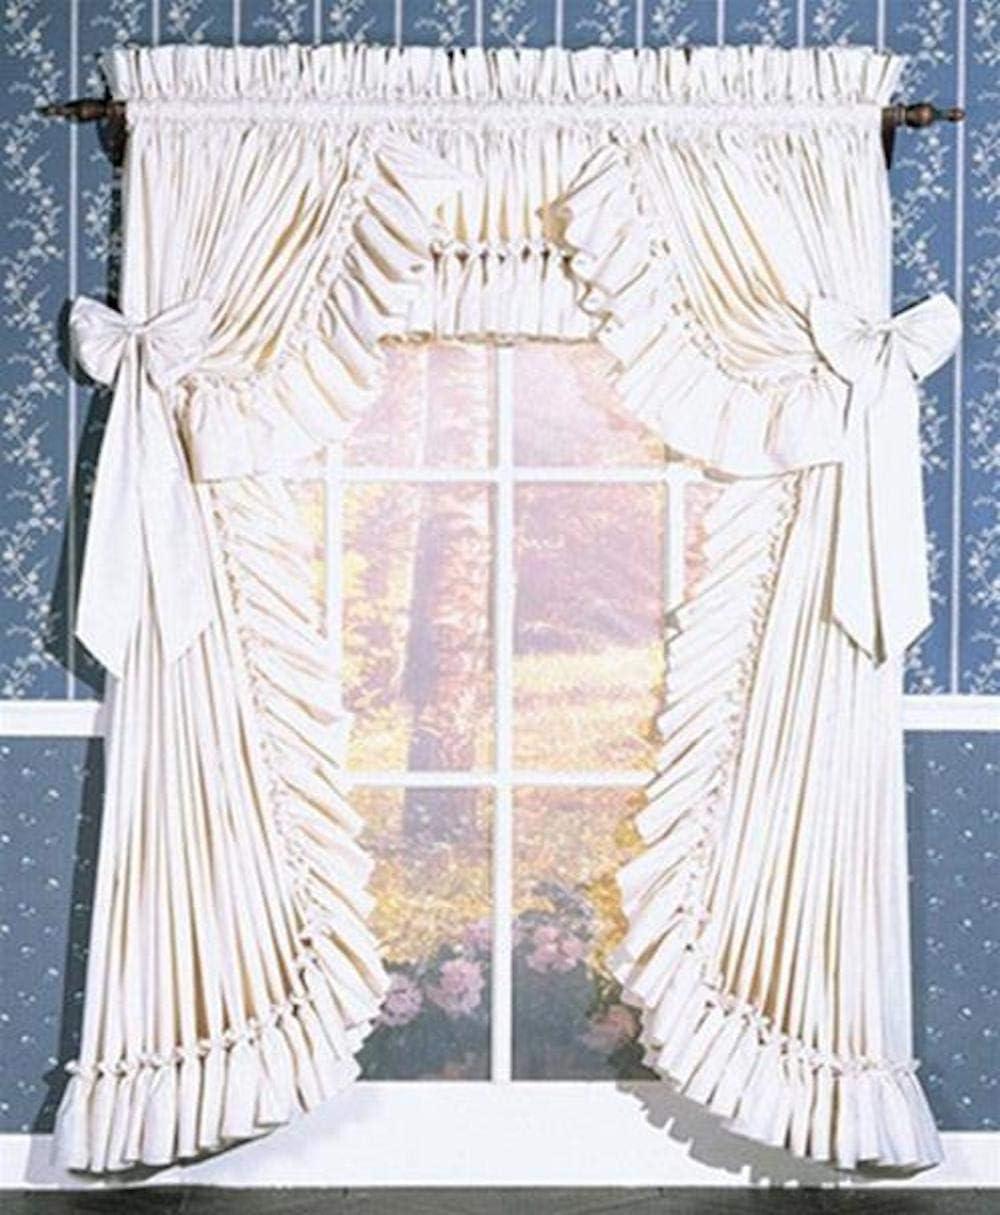 Pauls Home Fashions Carolina Country Priscilla Curtain 90W x 14L Ruffled Valance, Natural